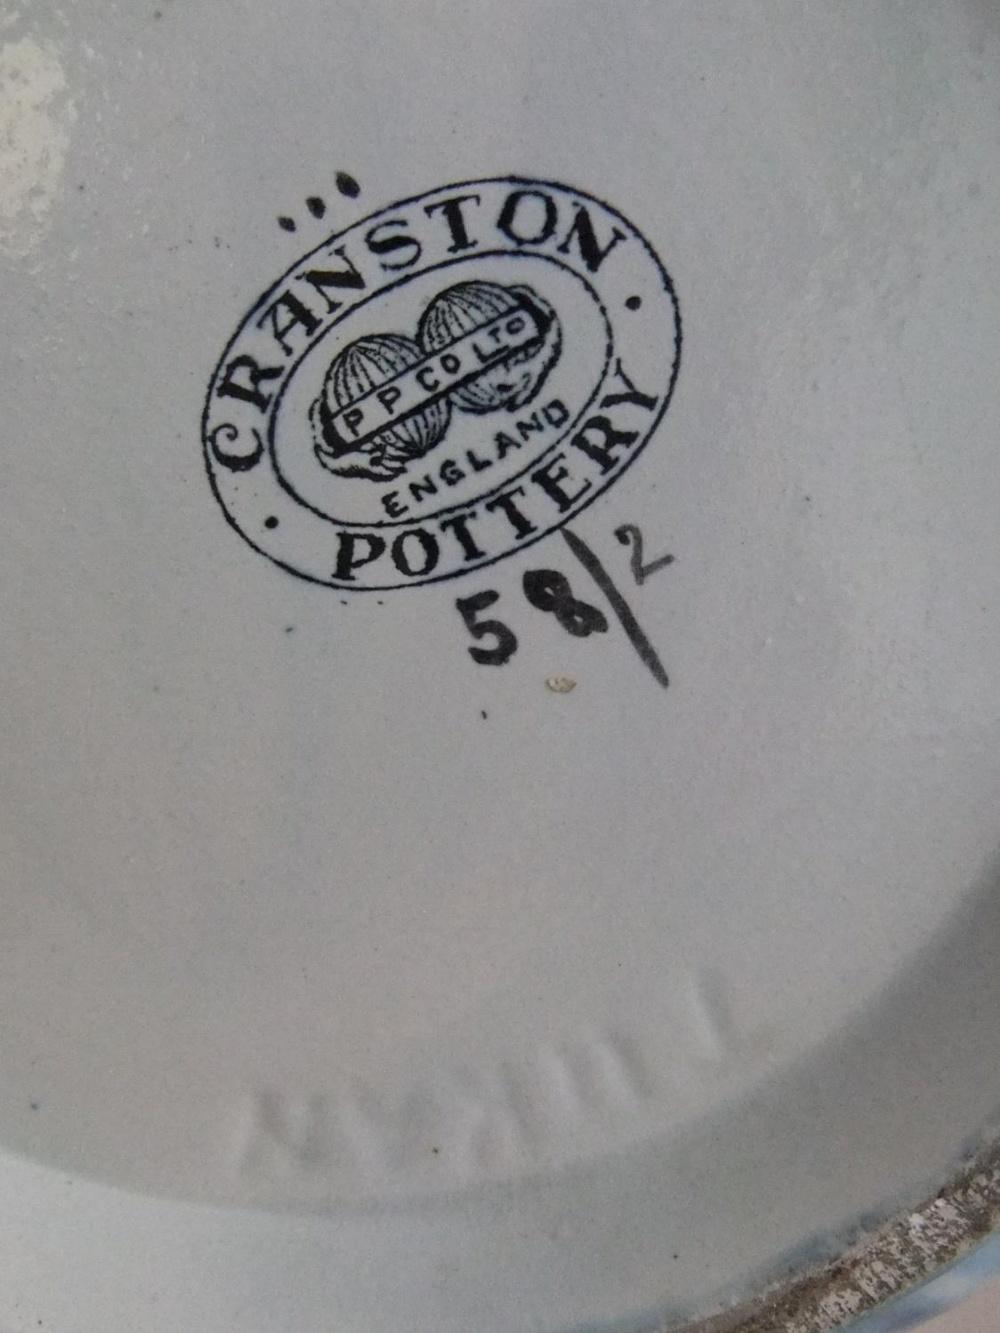 Stylised vintage Cranston pottery vase with grapes & leaves on mottled blue & grey ground 29 cm high - Image 4 of 4